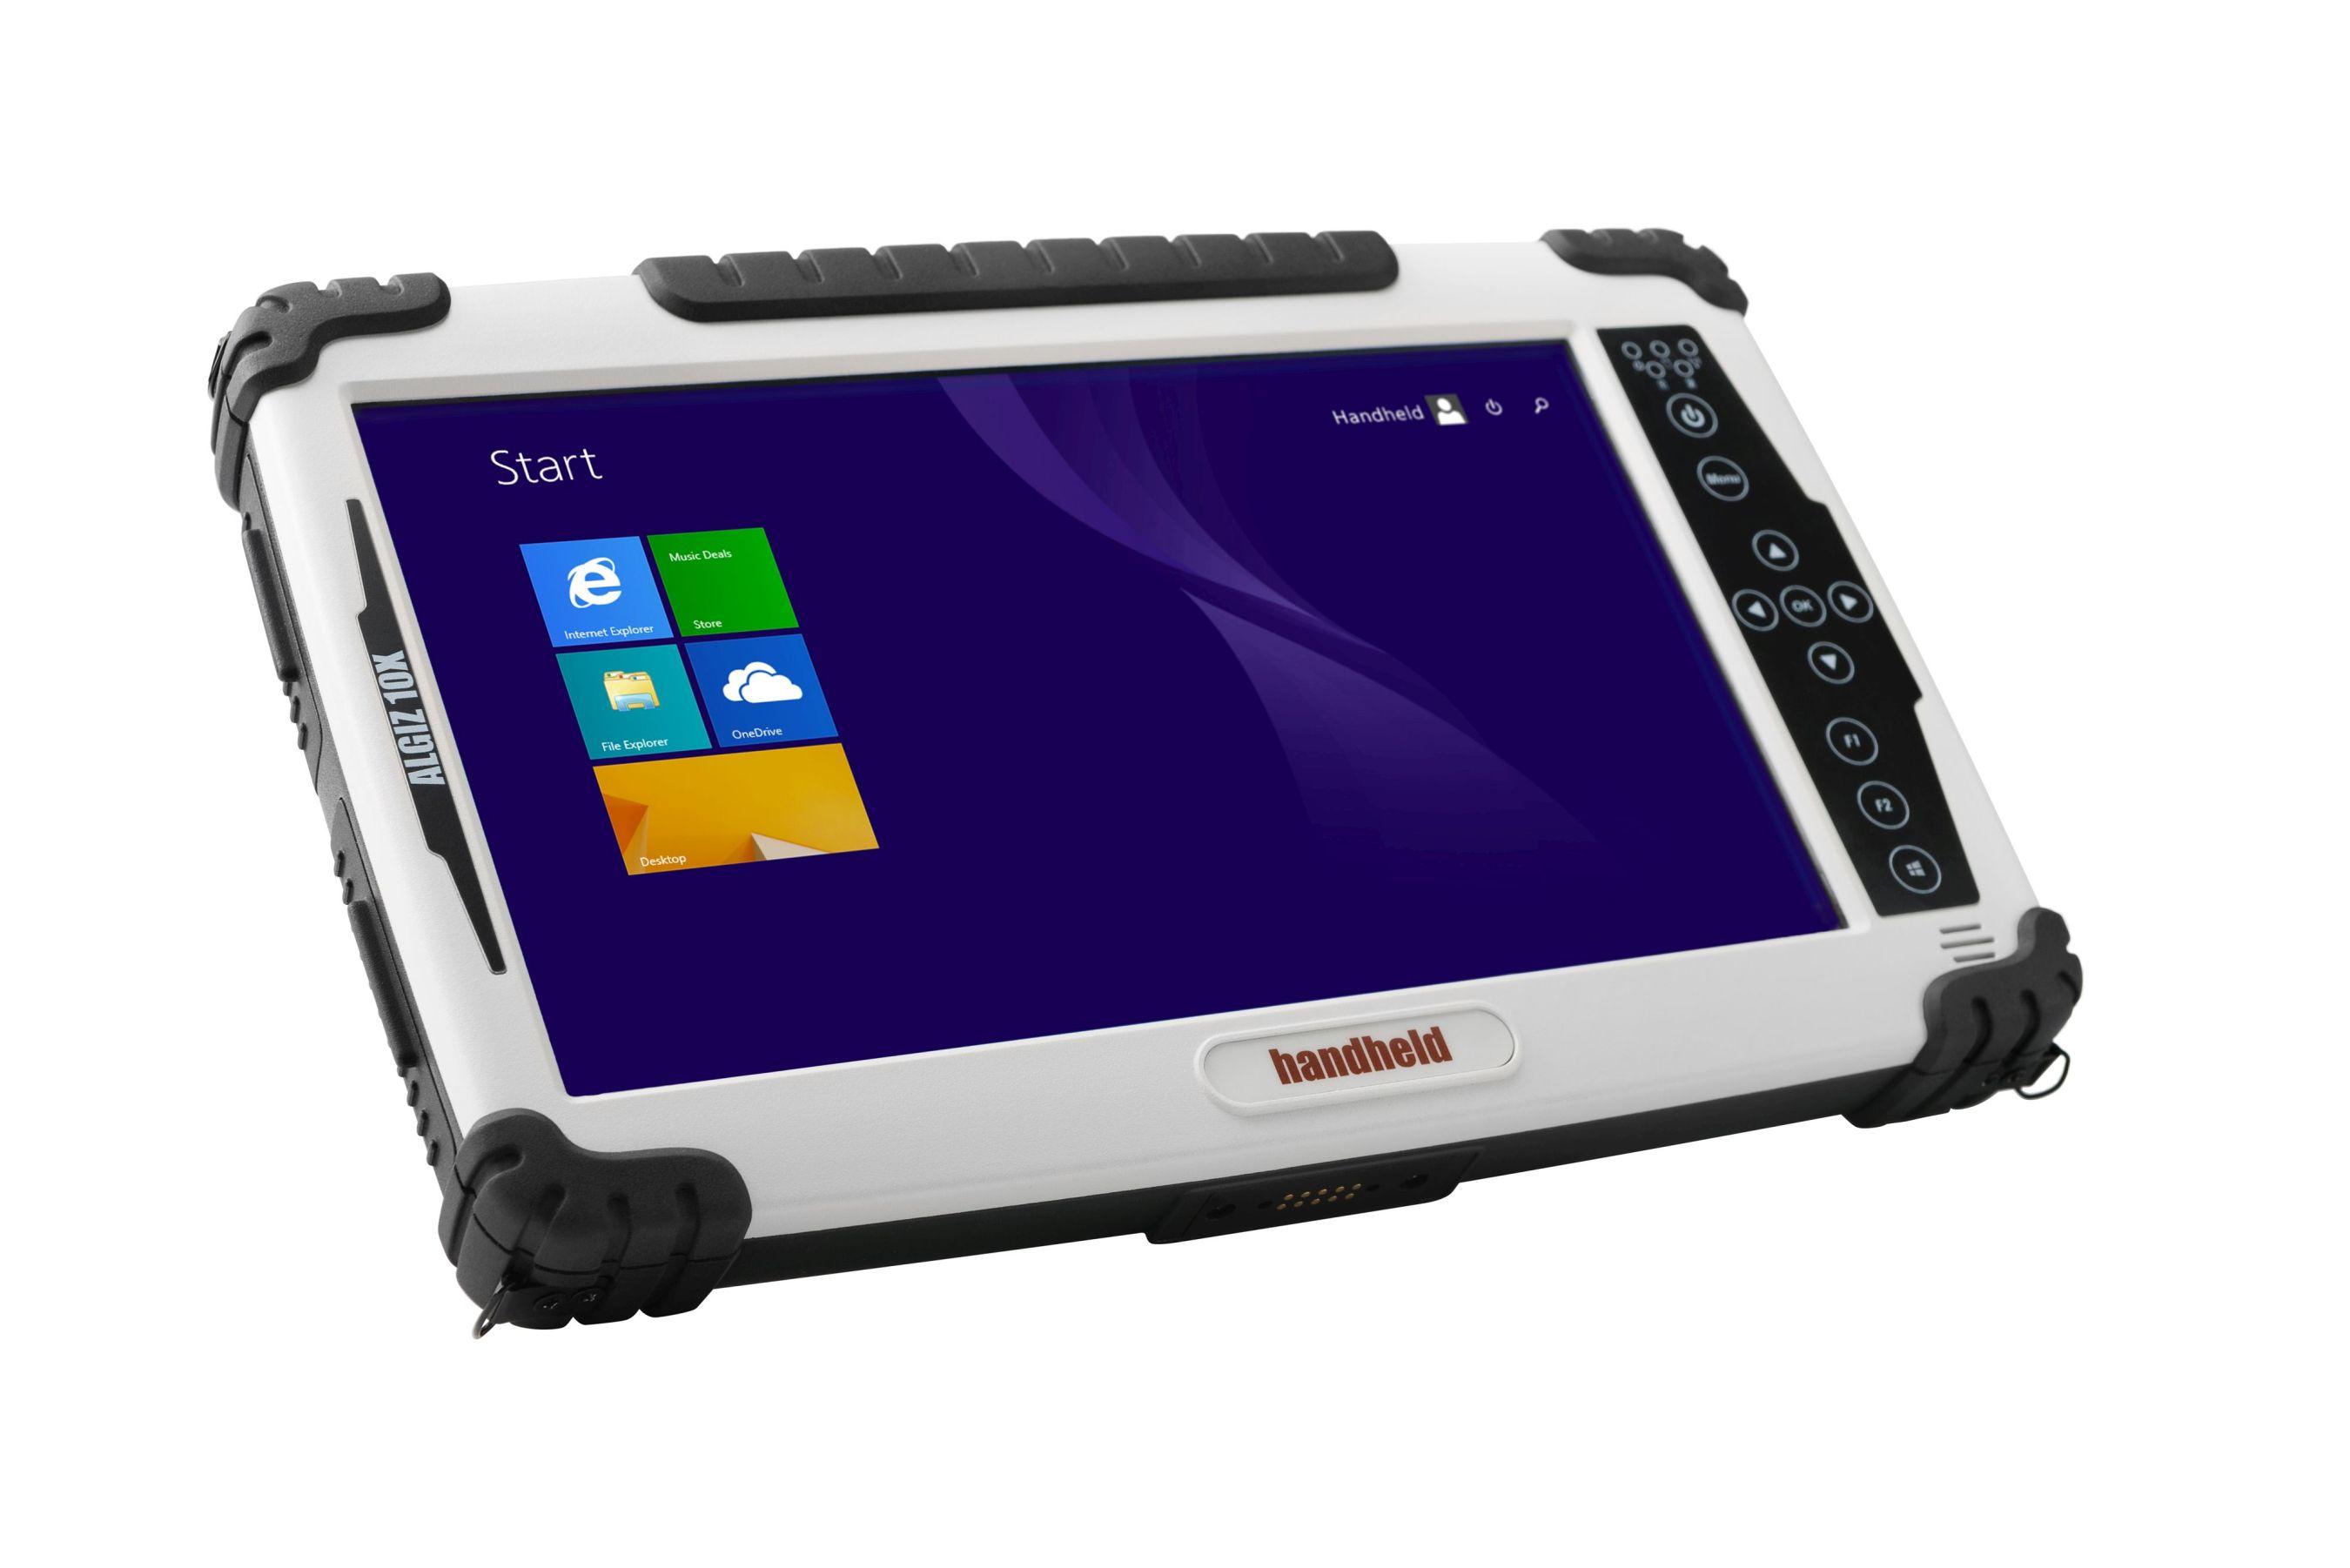 Handheld Announces Major Upgrade To Algiz 10x Rugged Tablet